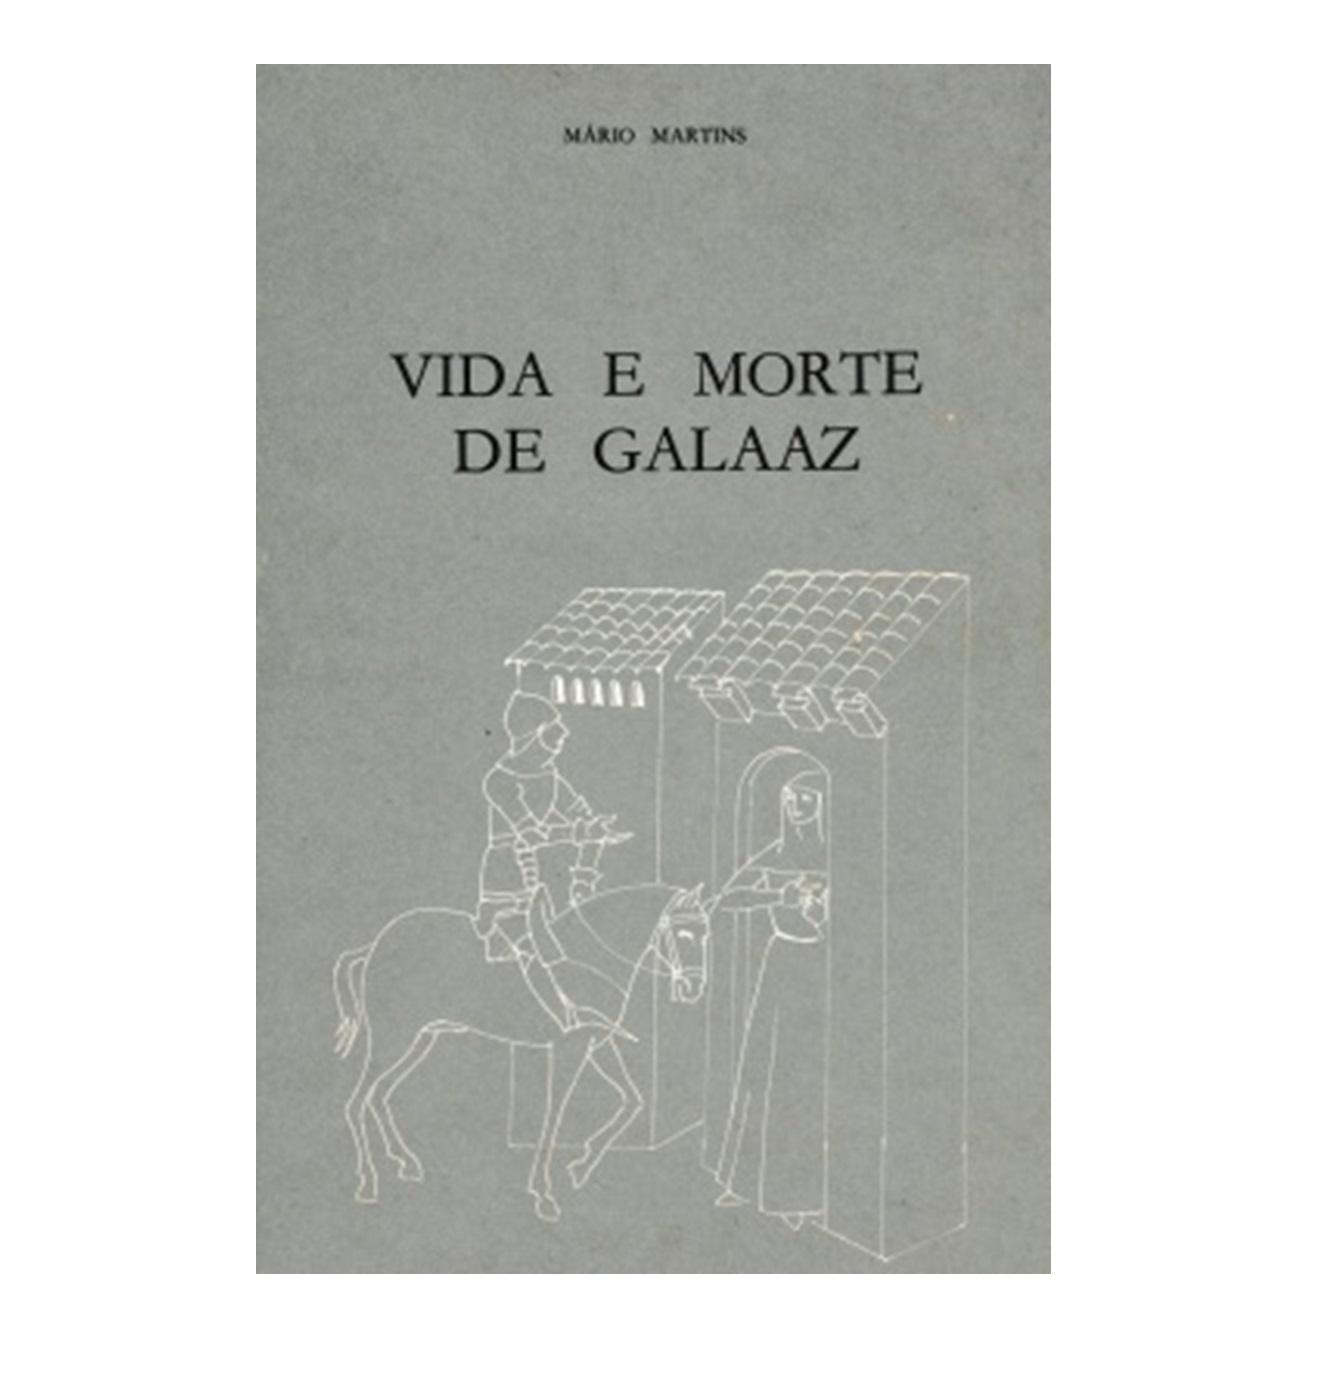 Vida e Morte de Galaaz.